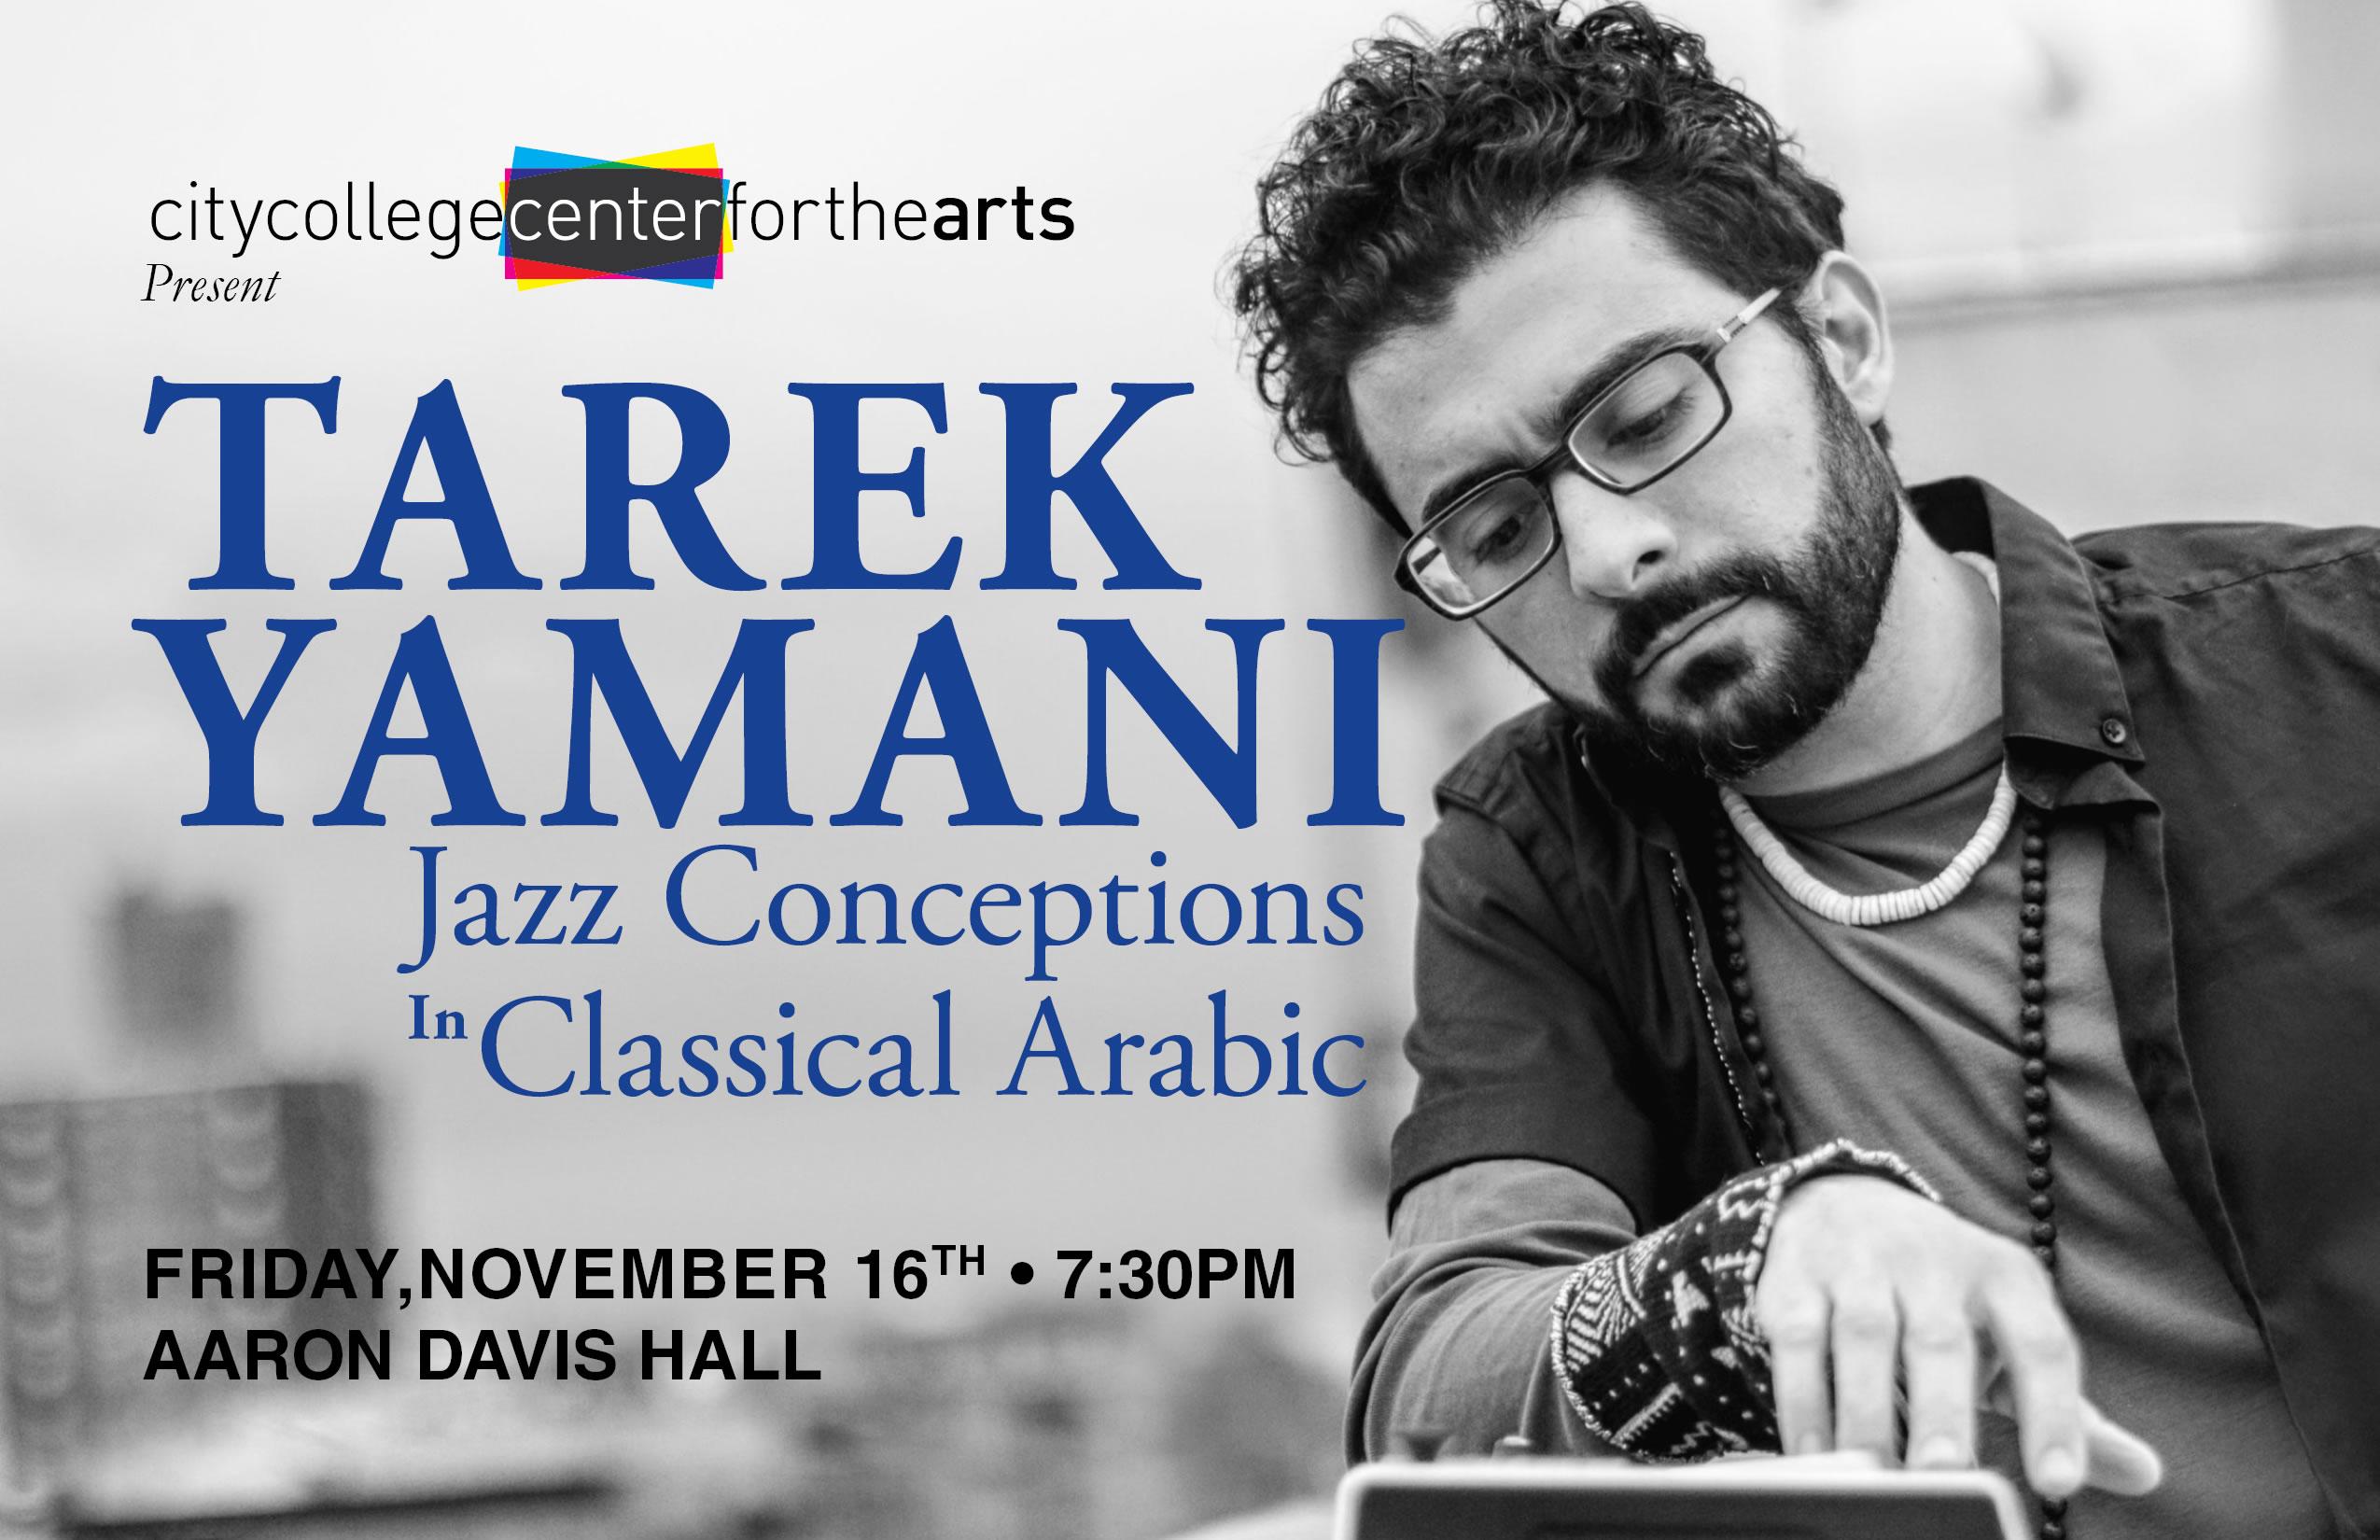 Tarek Yamani in Jazz Conceptions in Classical Arabic, Friday, November 16, Aaron Davis Hall!